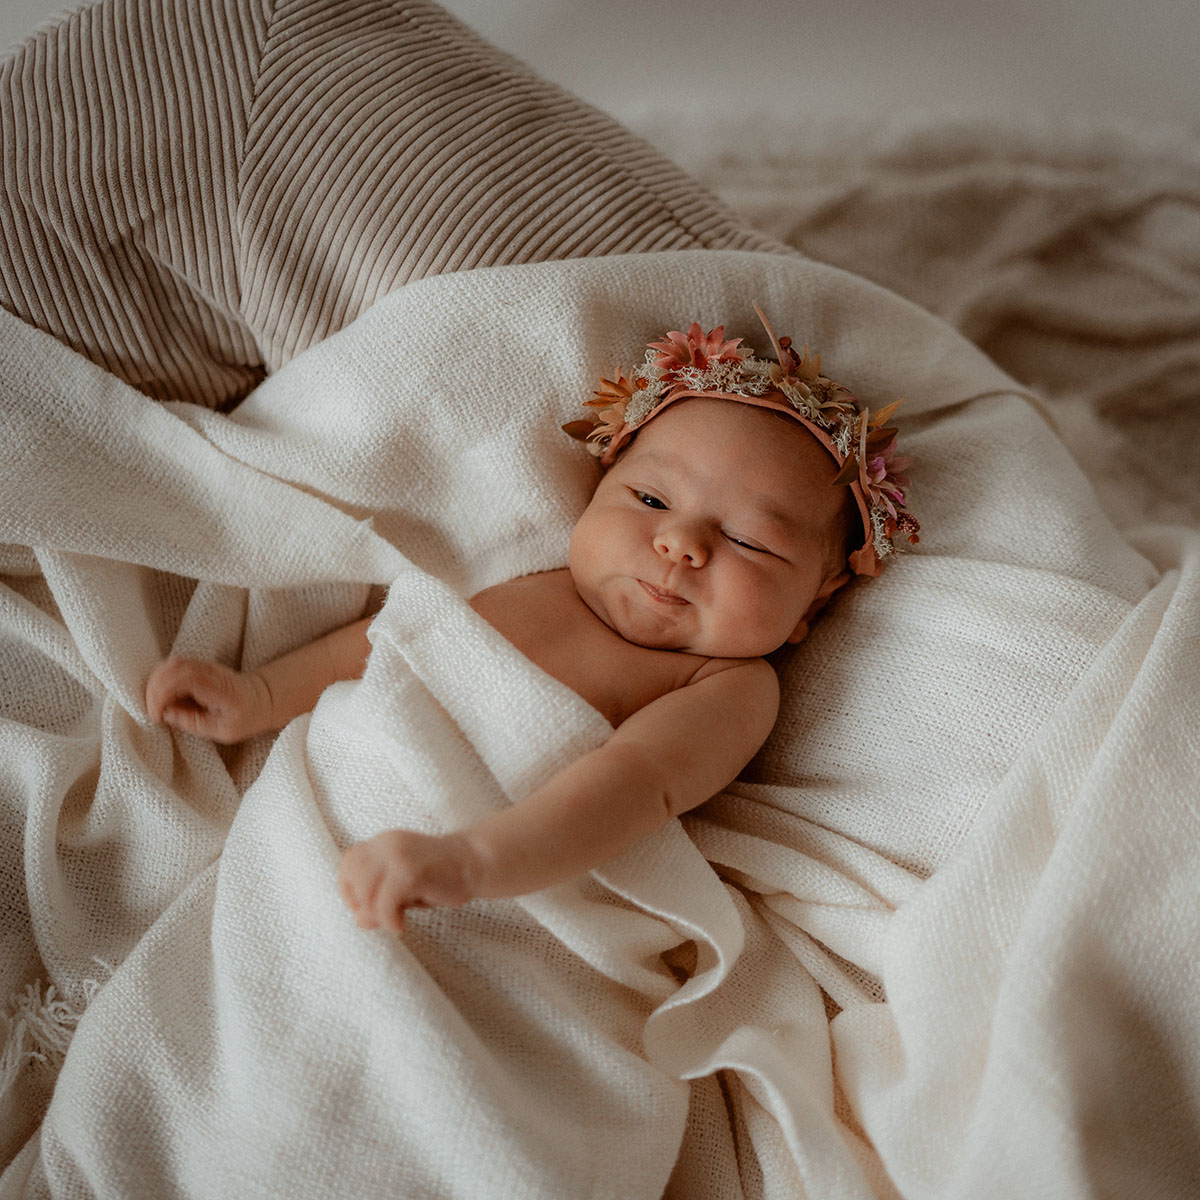 Fotoshooting Neugeborenes Baby Studio Linz